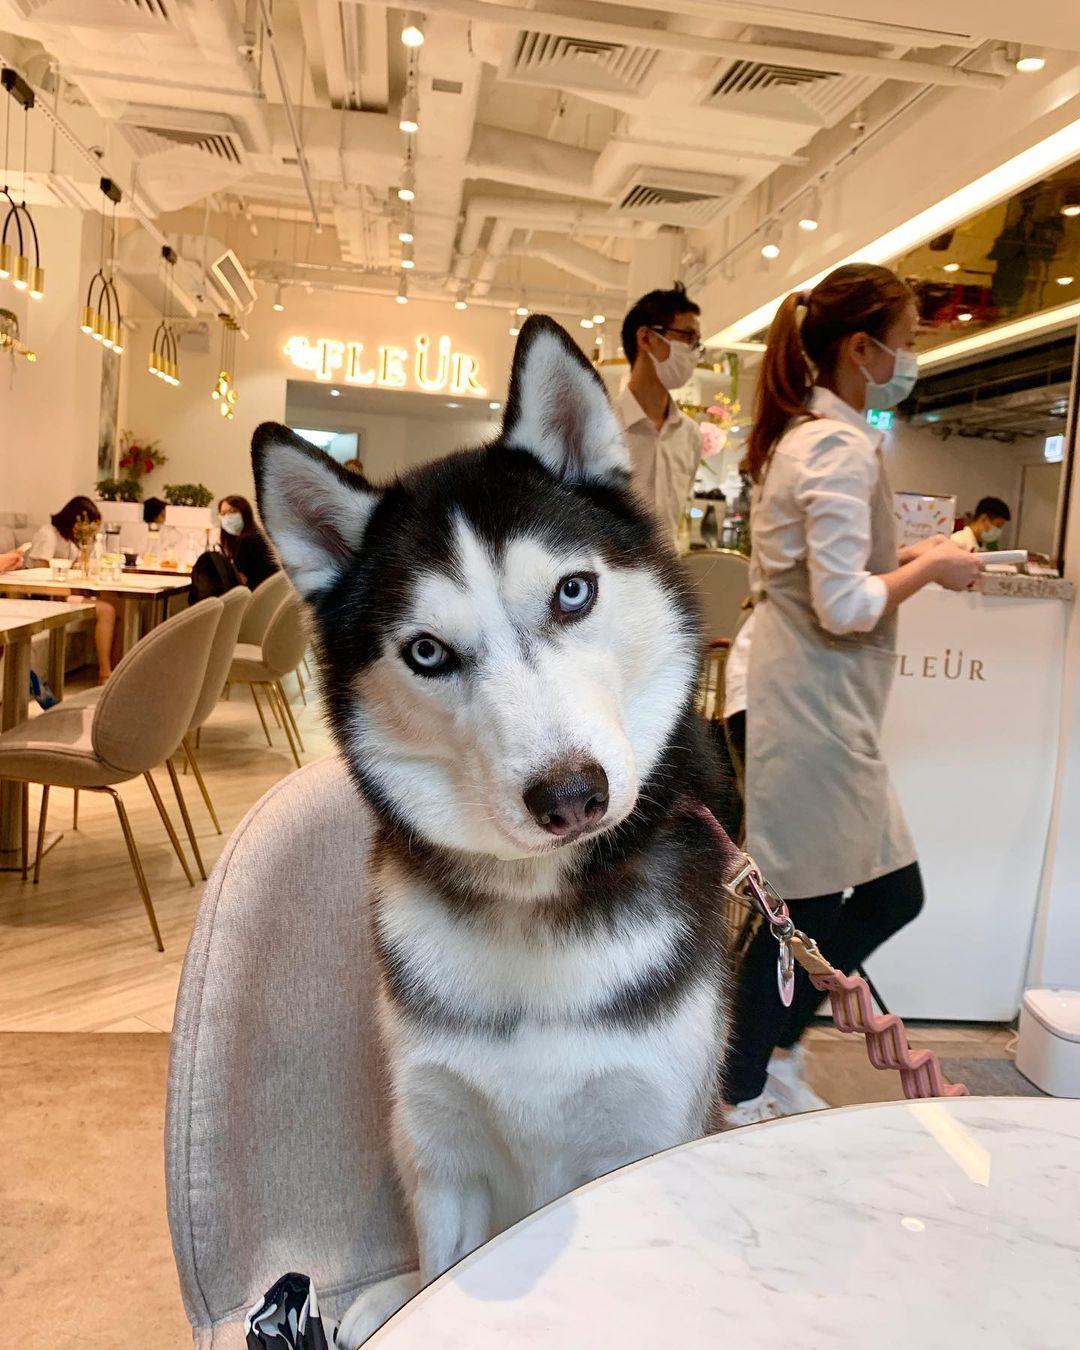 Hermoso husky en un restaurante